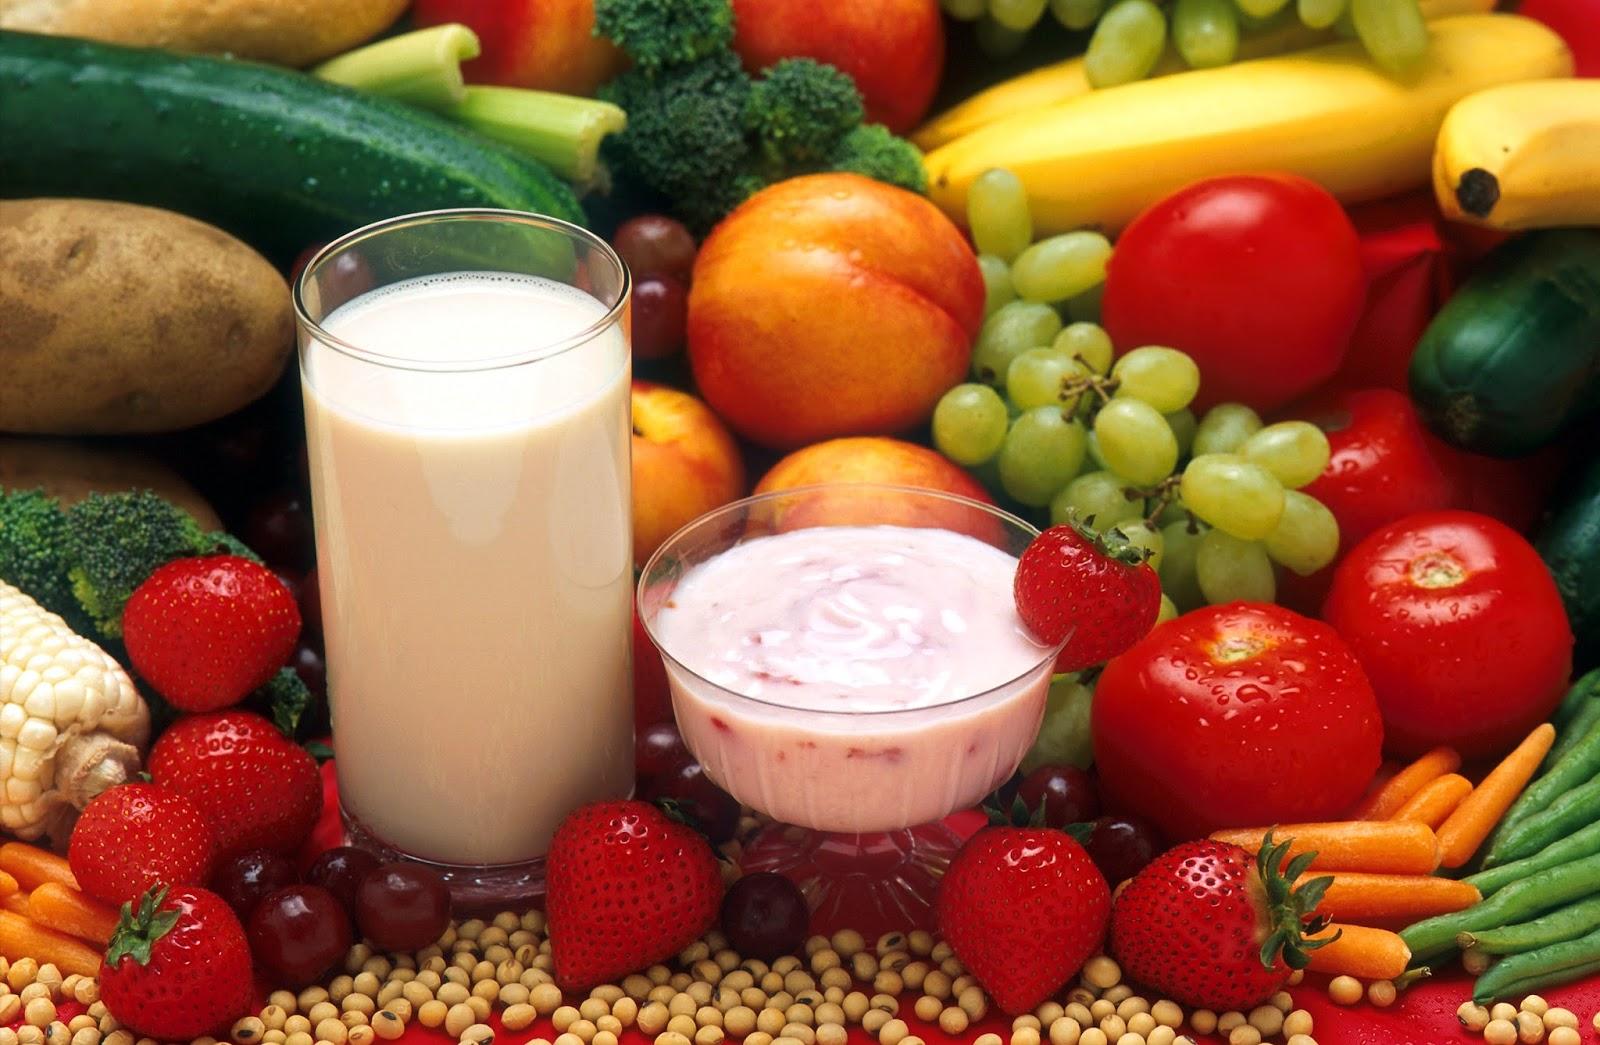 Makanan Yang Baik Untuk Ibu Hamil Muda Yang Disarankan Dokter